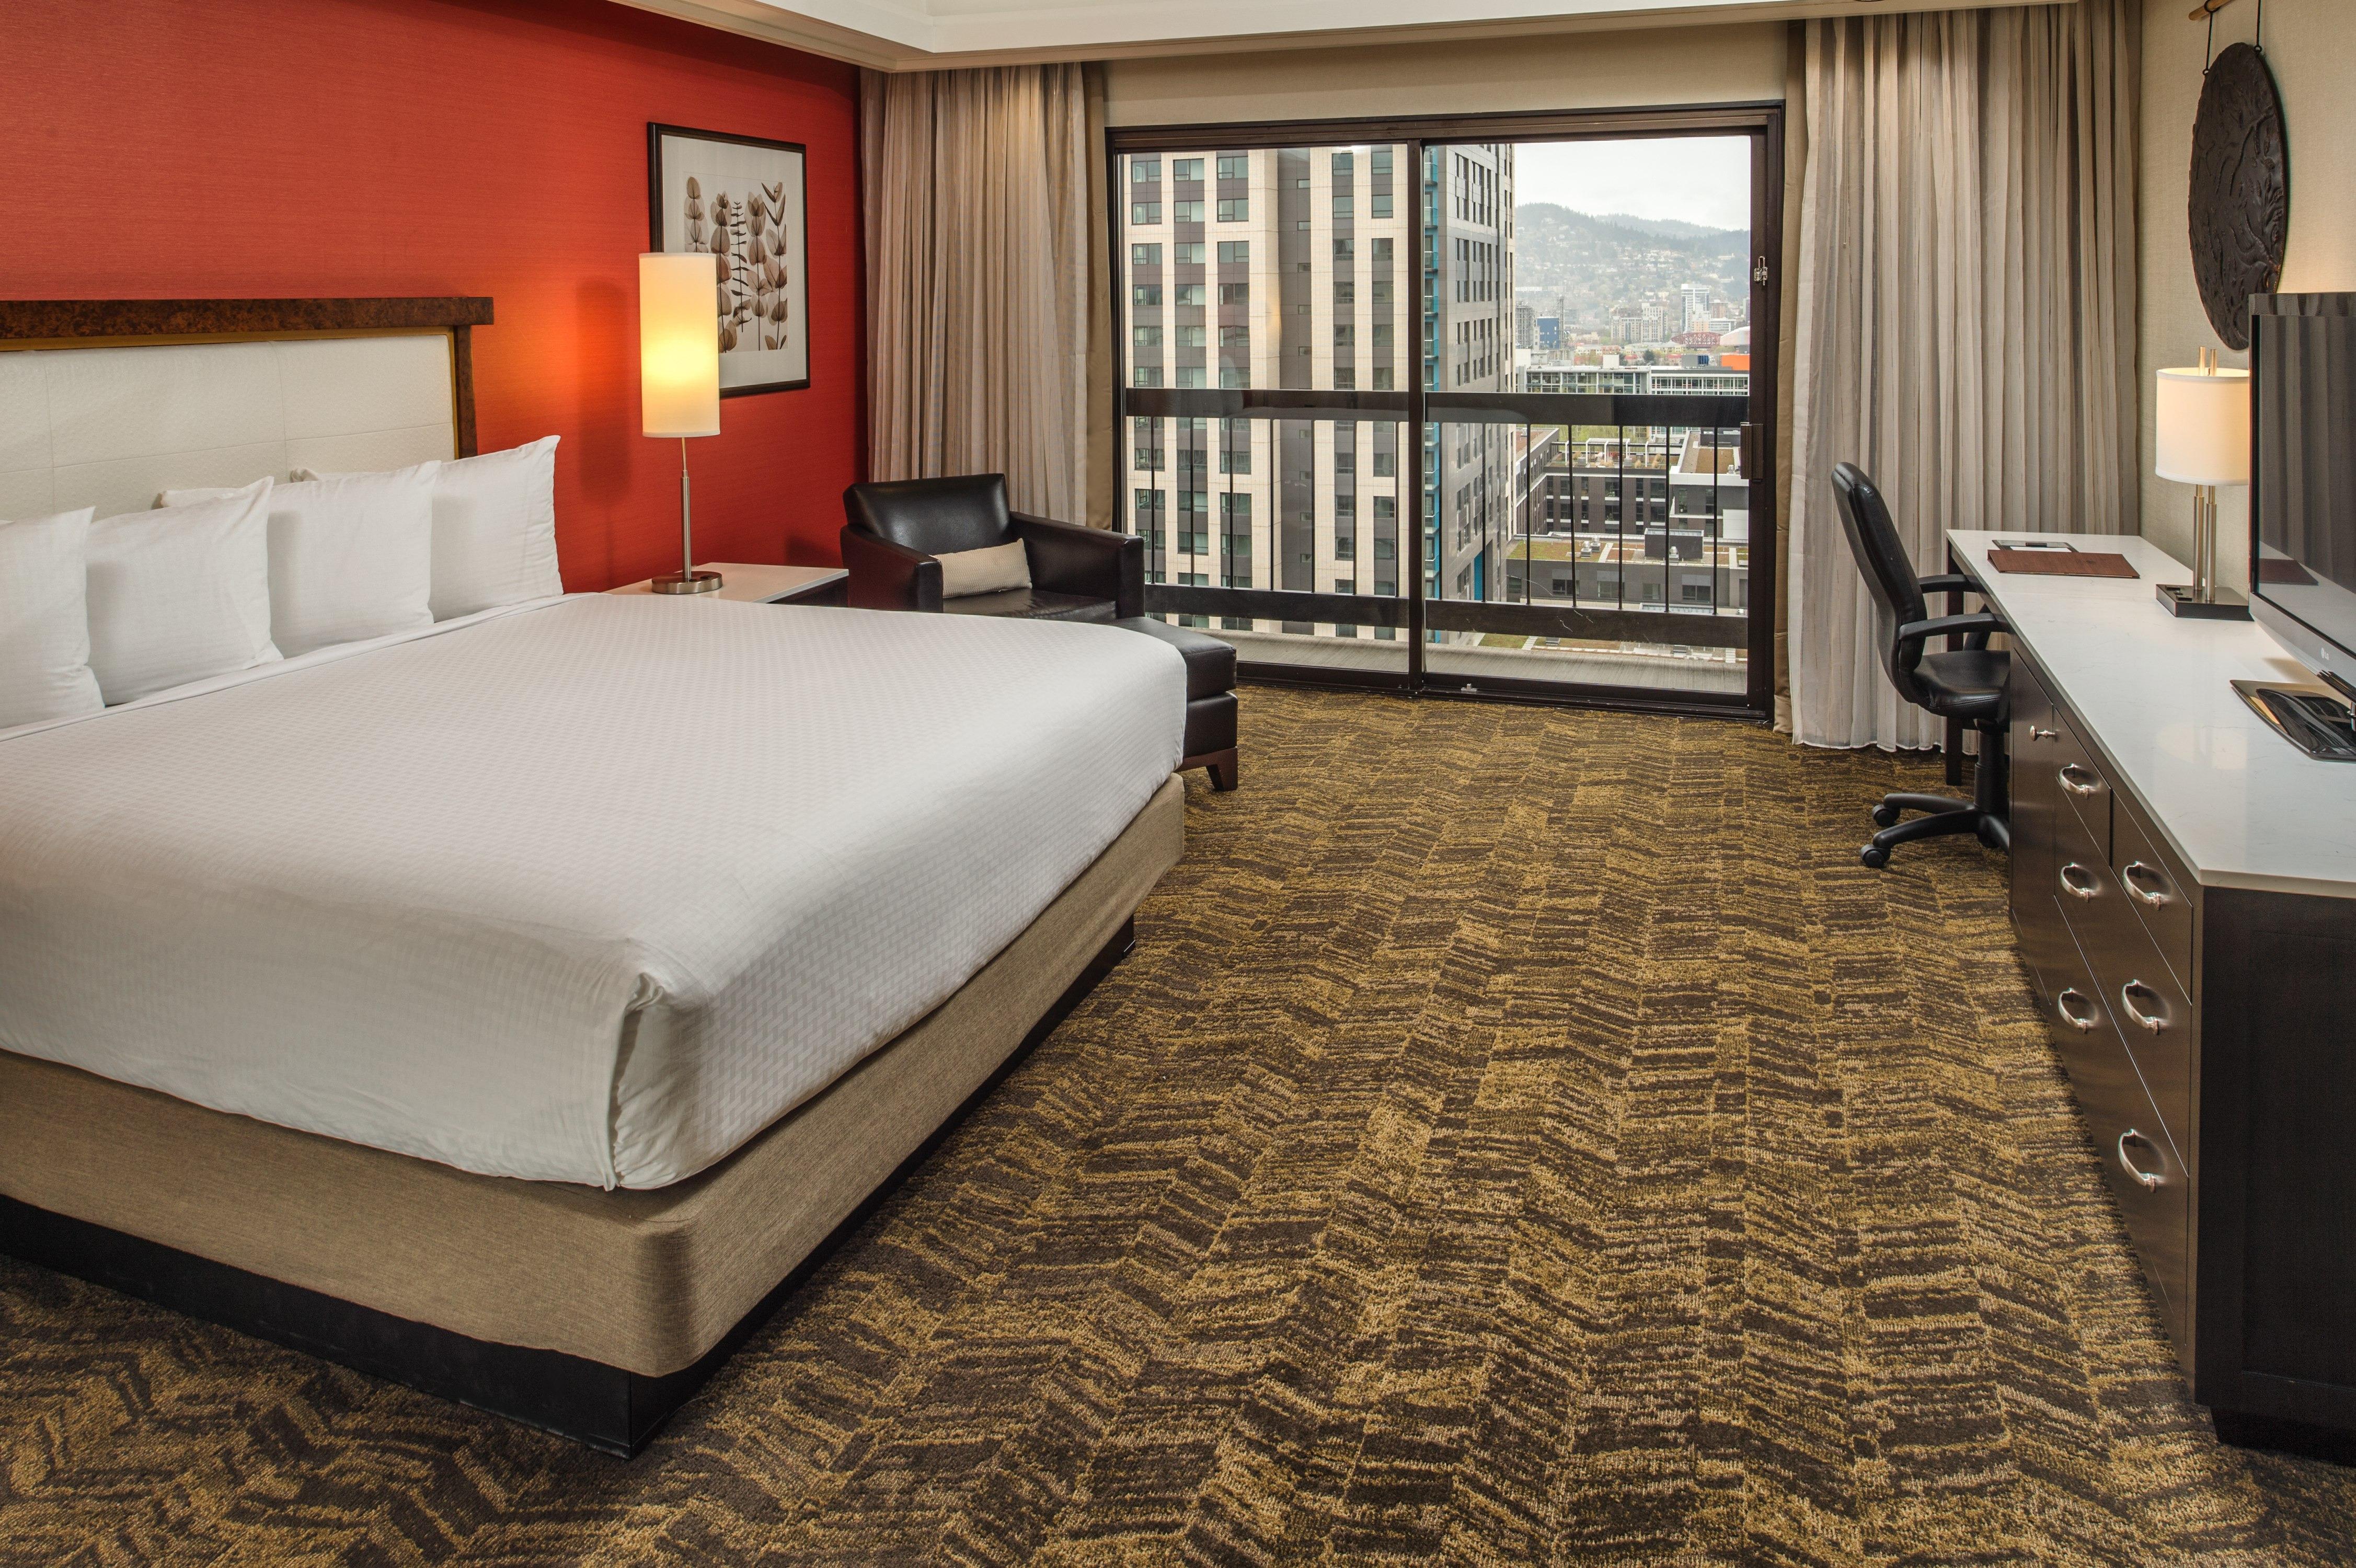 DoubleTree by Hilton Hotel Portland image 2